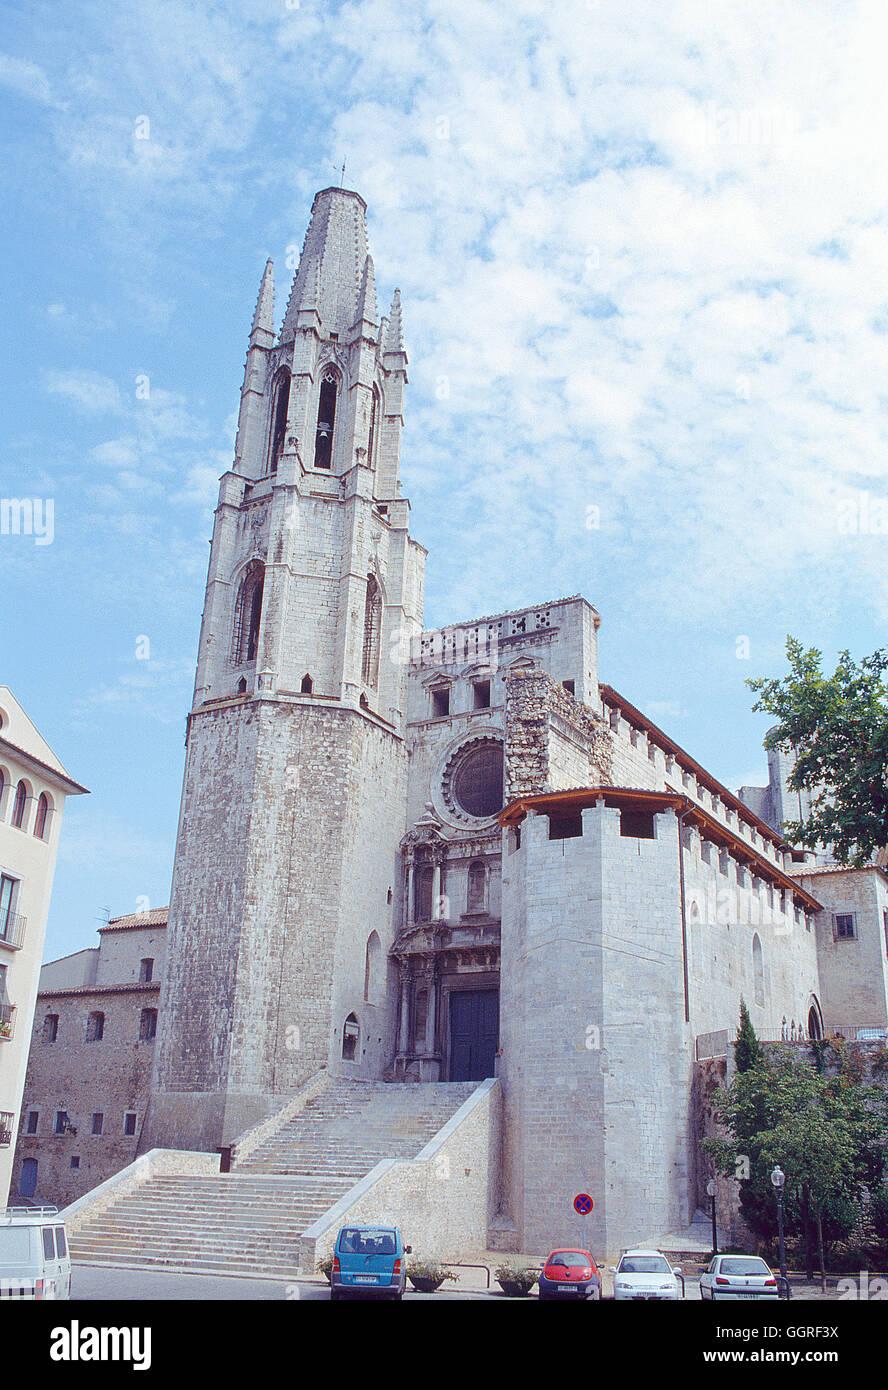 Facade of Sant Feliu church. Gerona, Spain. - Stock Image